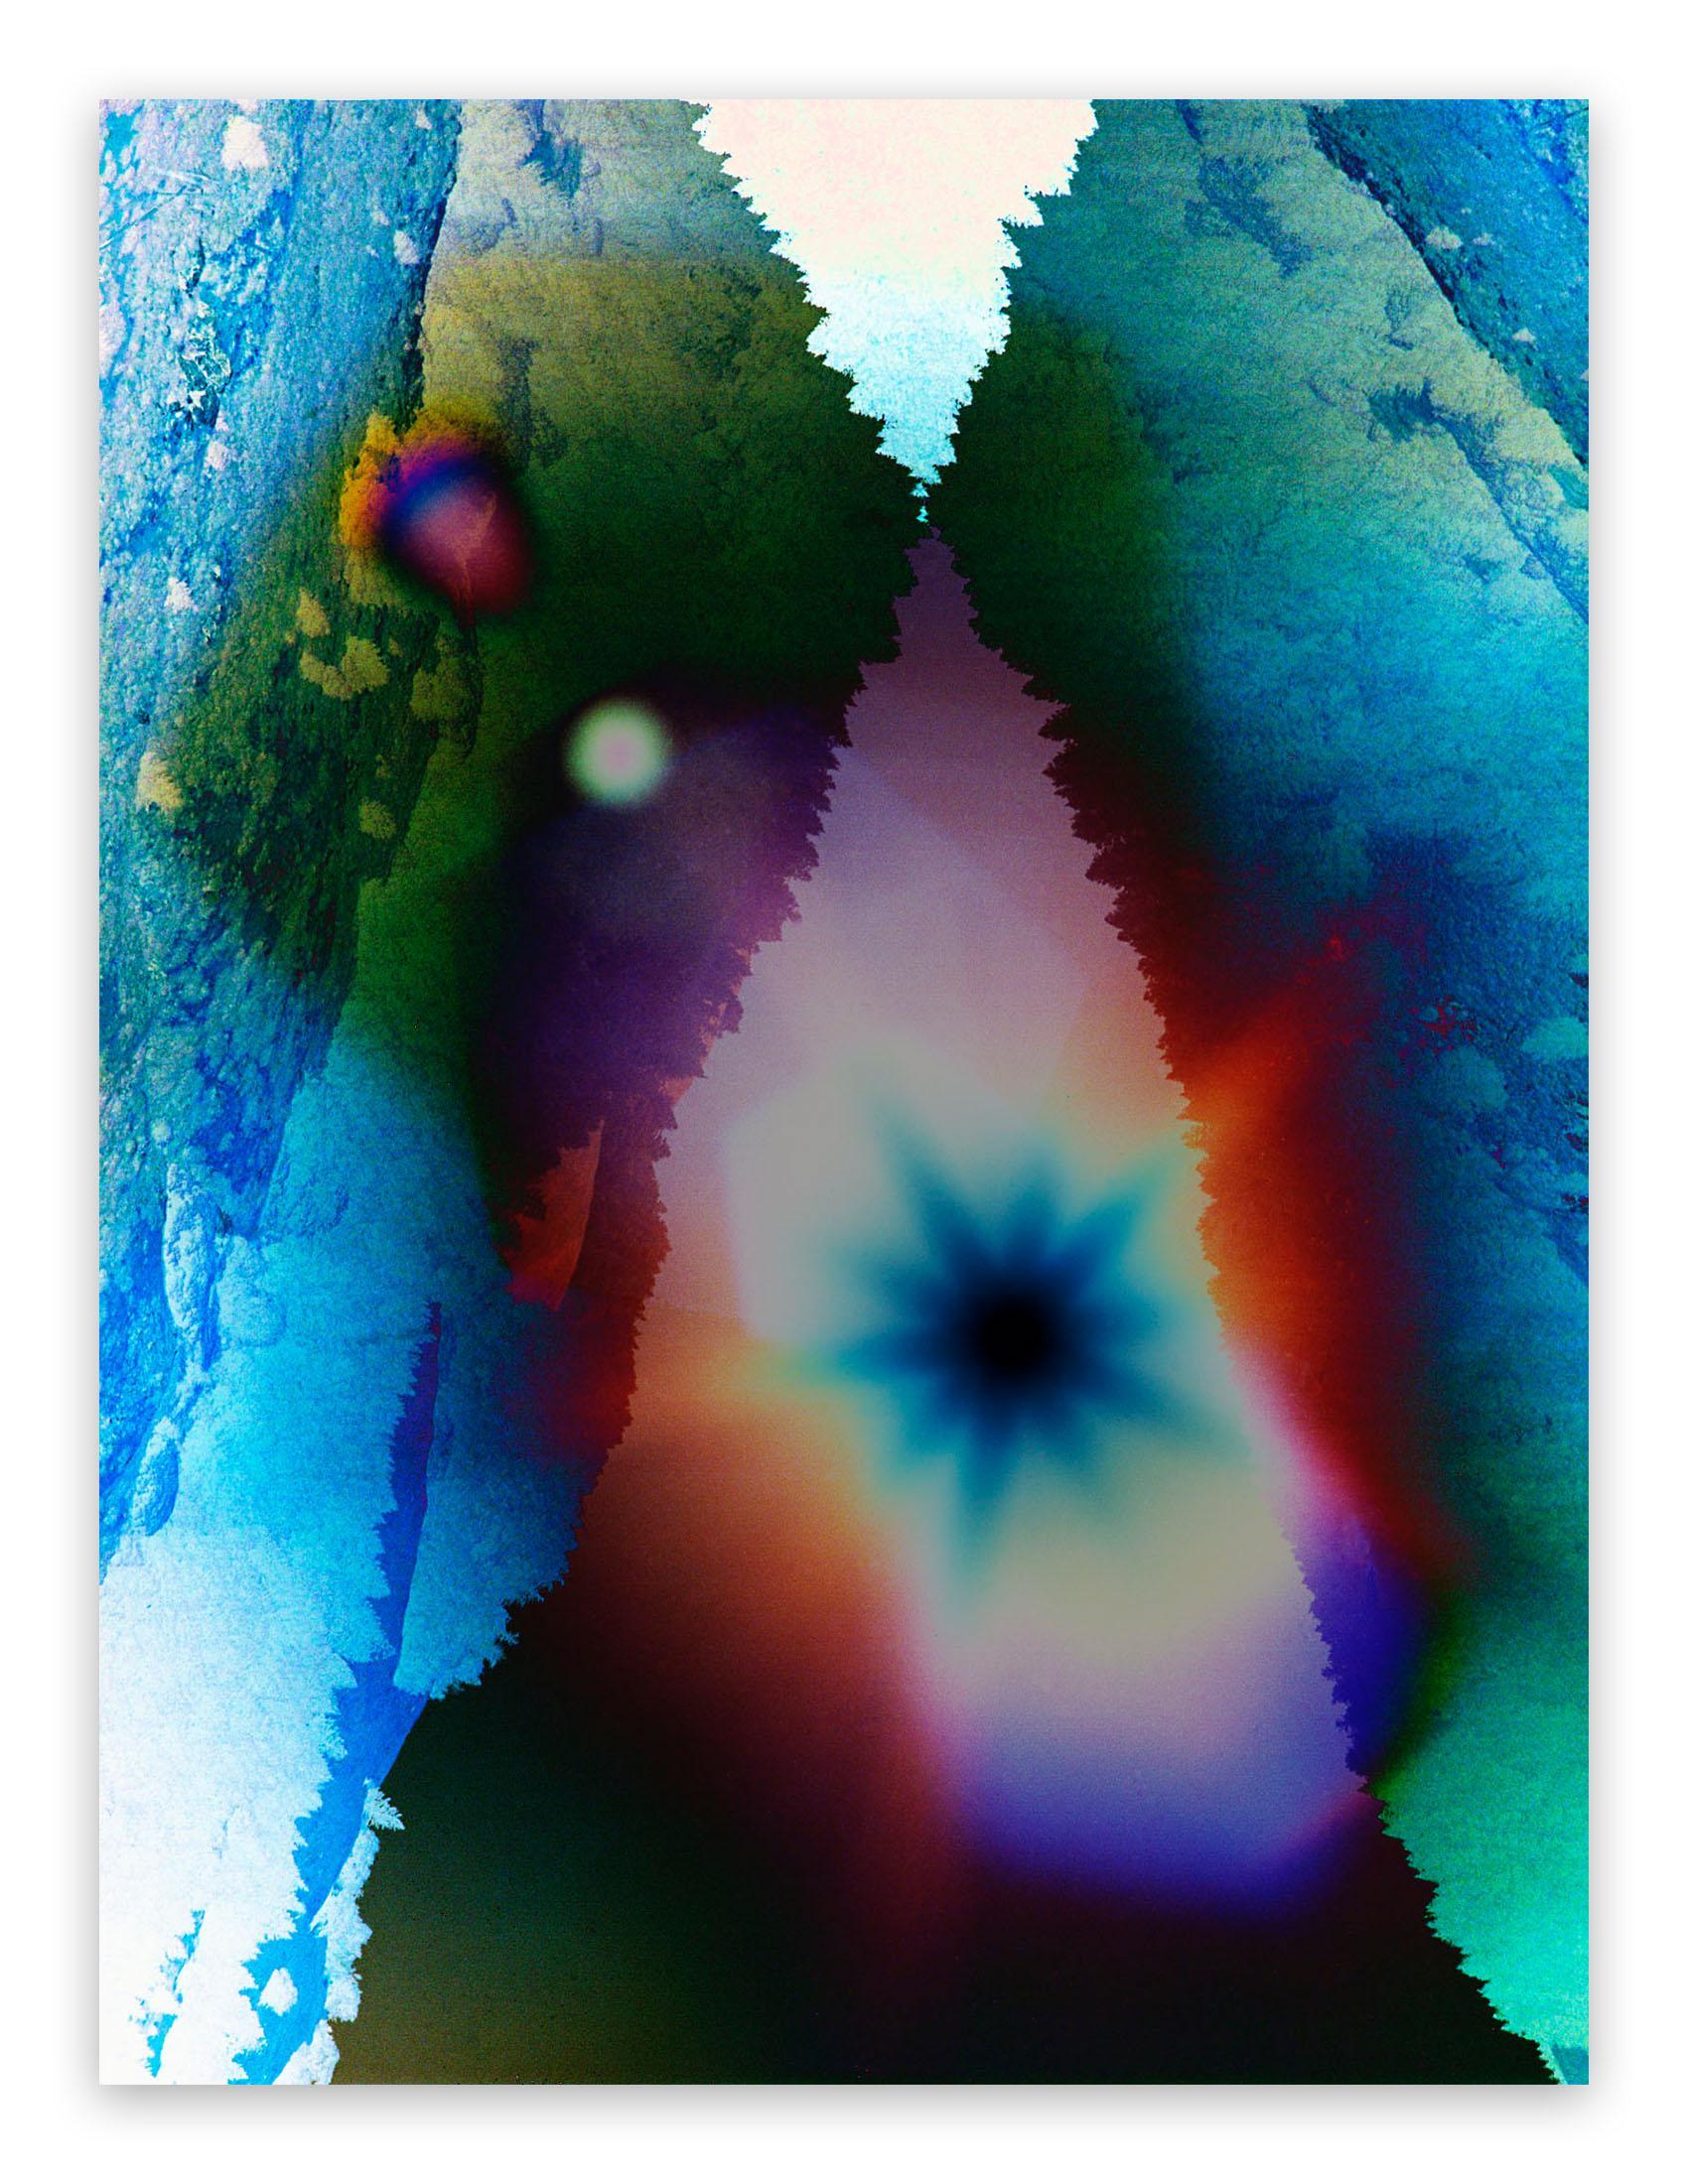 Sun Mountain Wild Vision (Abstract photography)